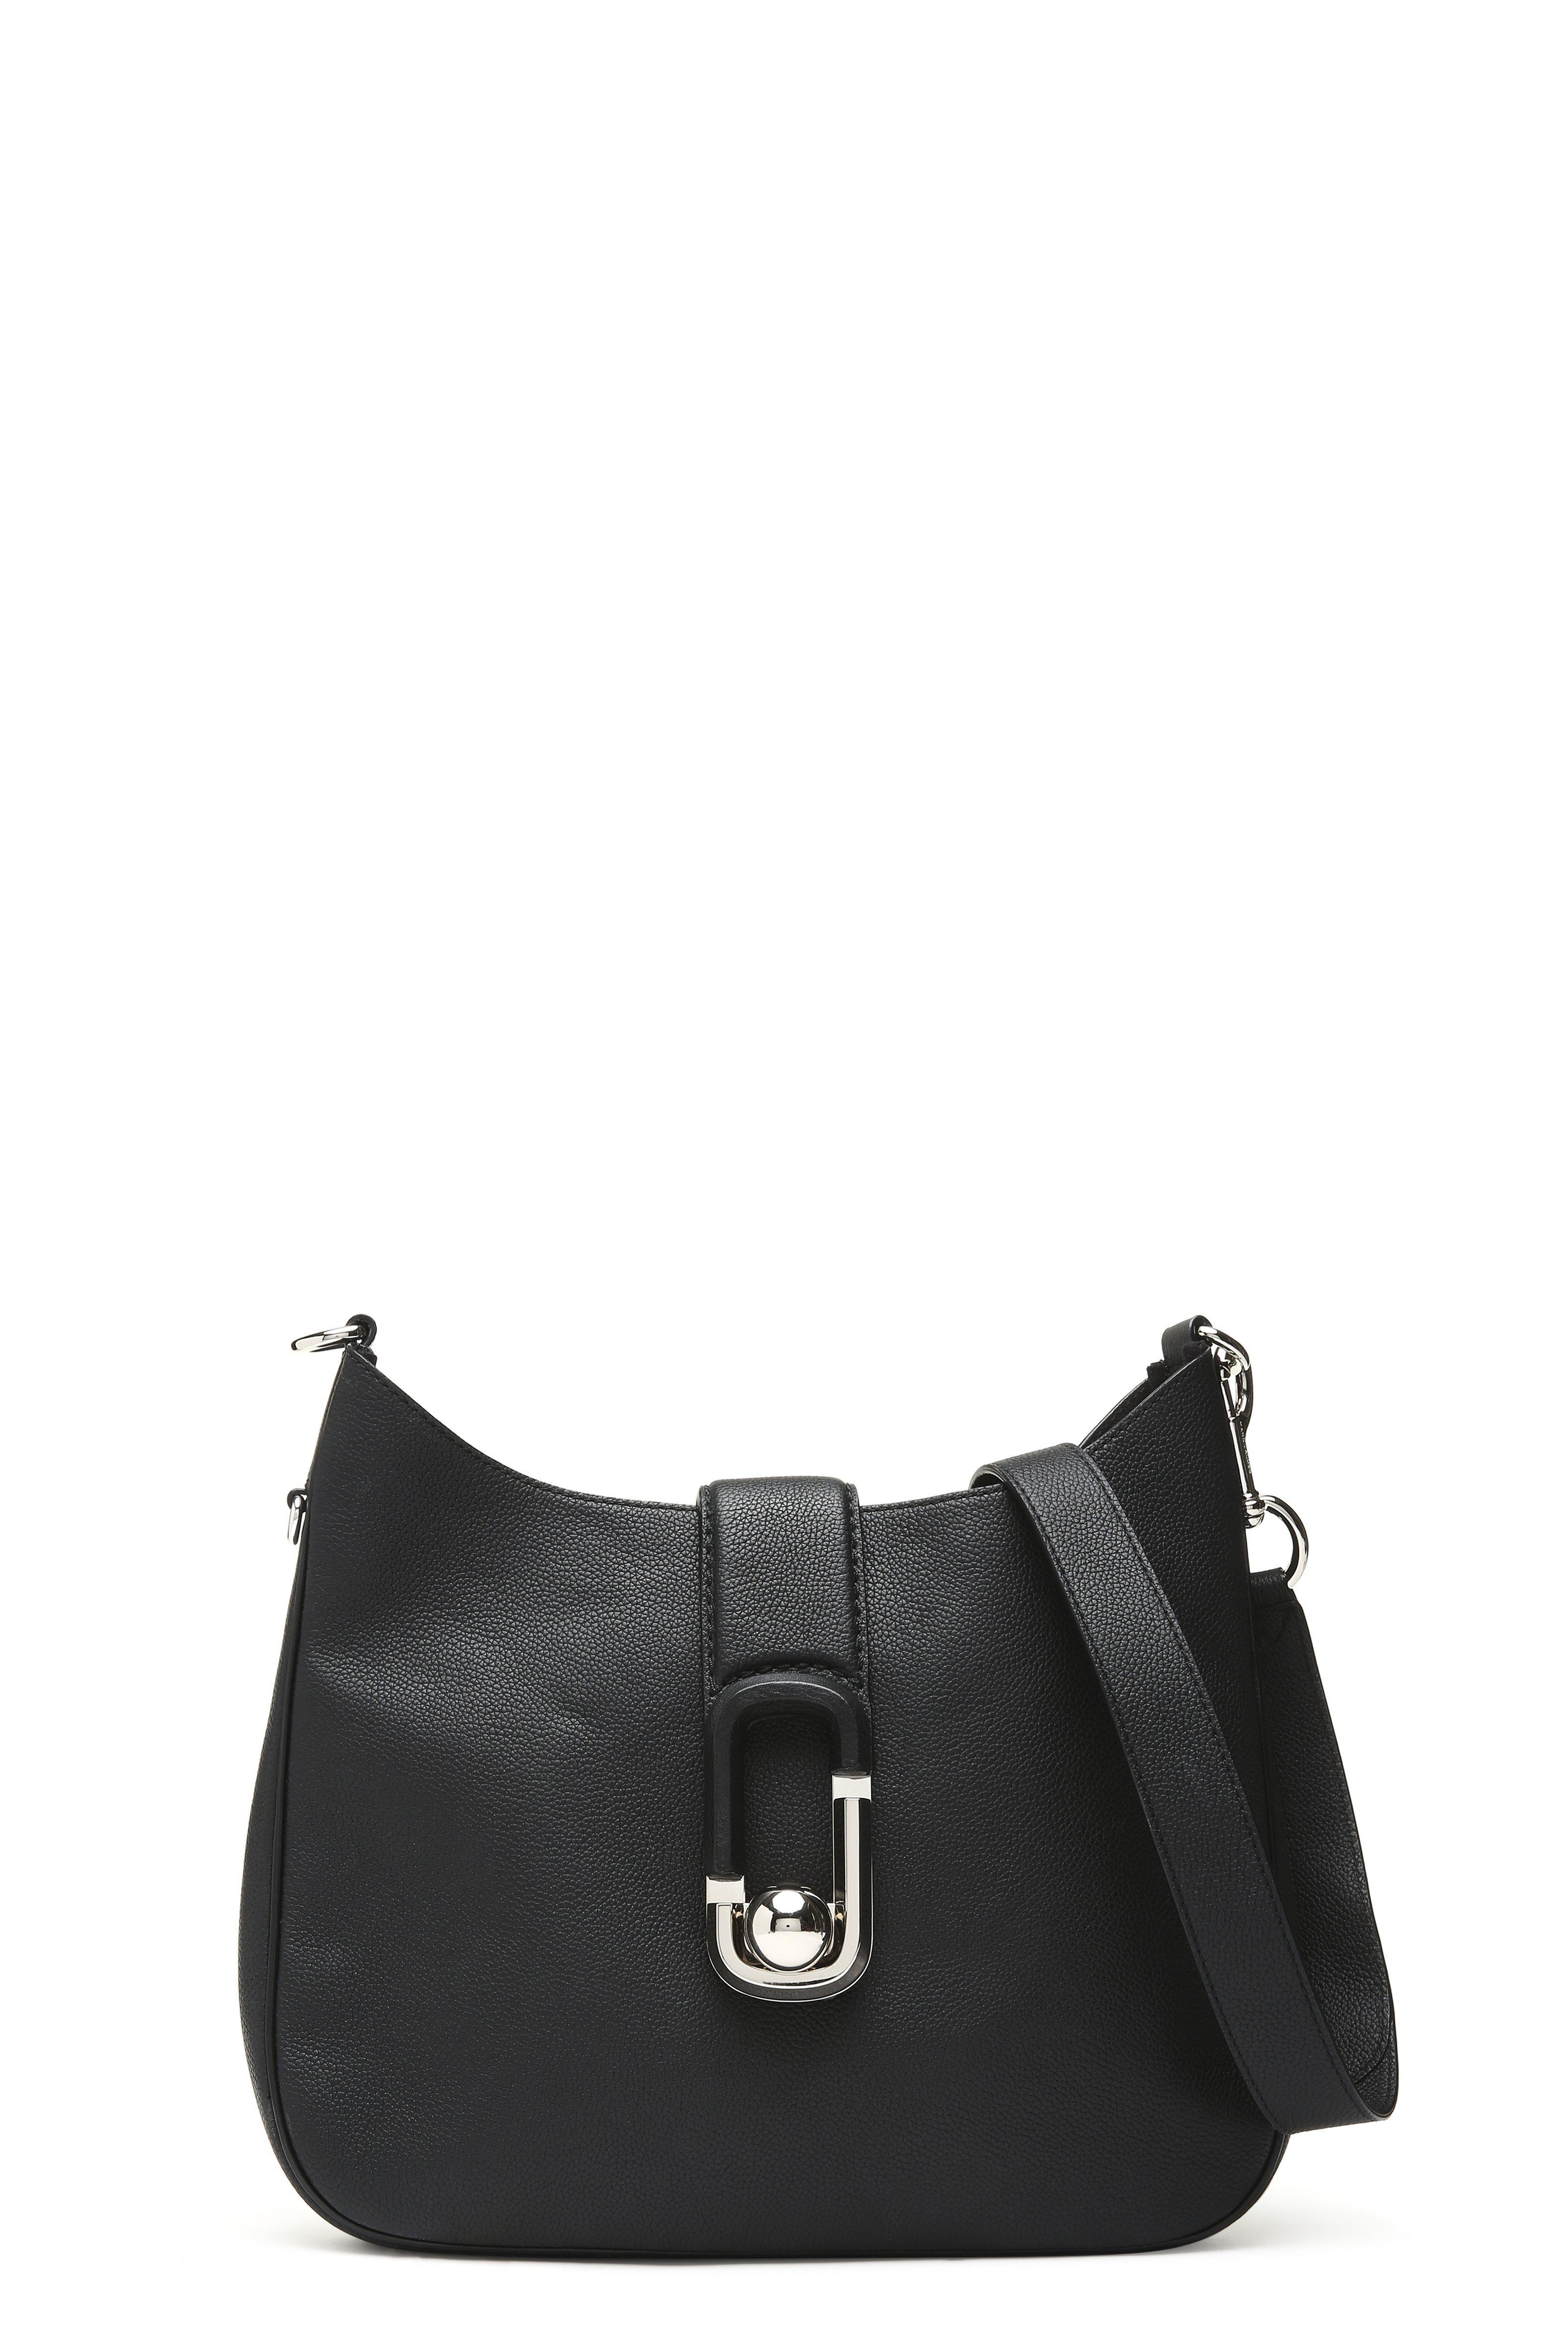 6db204c65b92 Marc Jacobs Interlock Leather Small Hobo Bag In Black